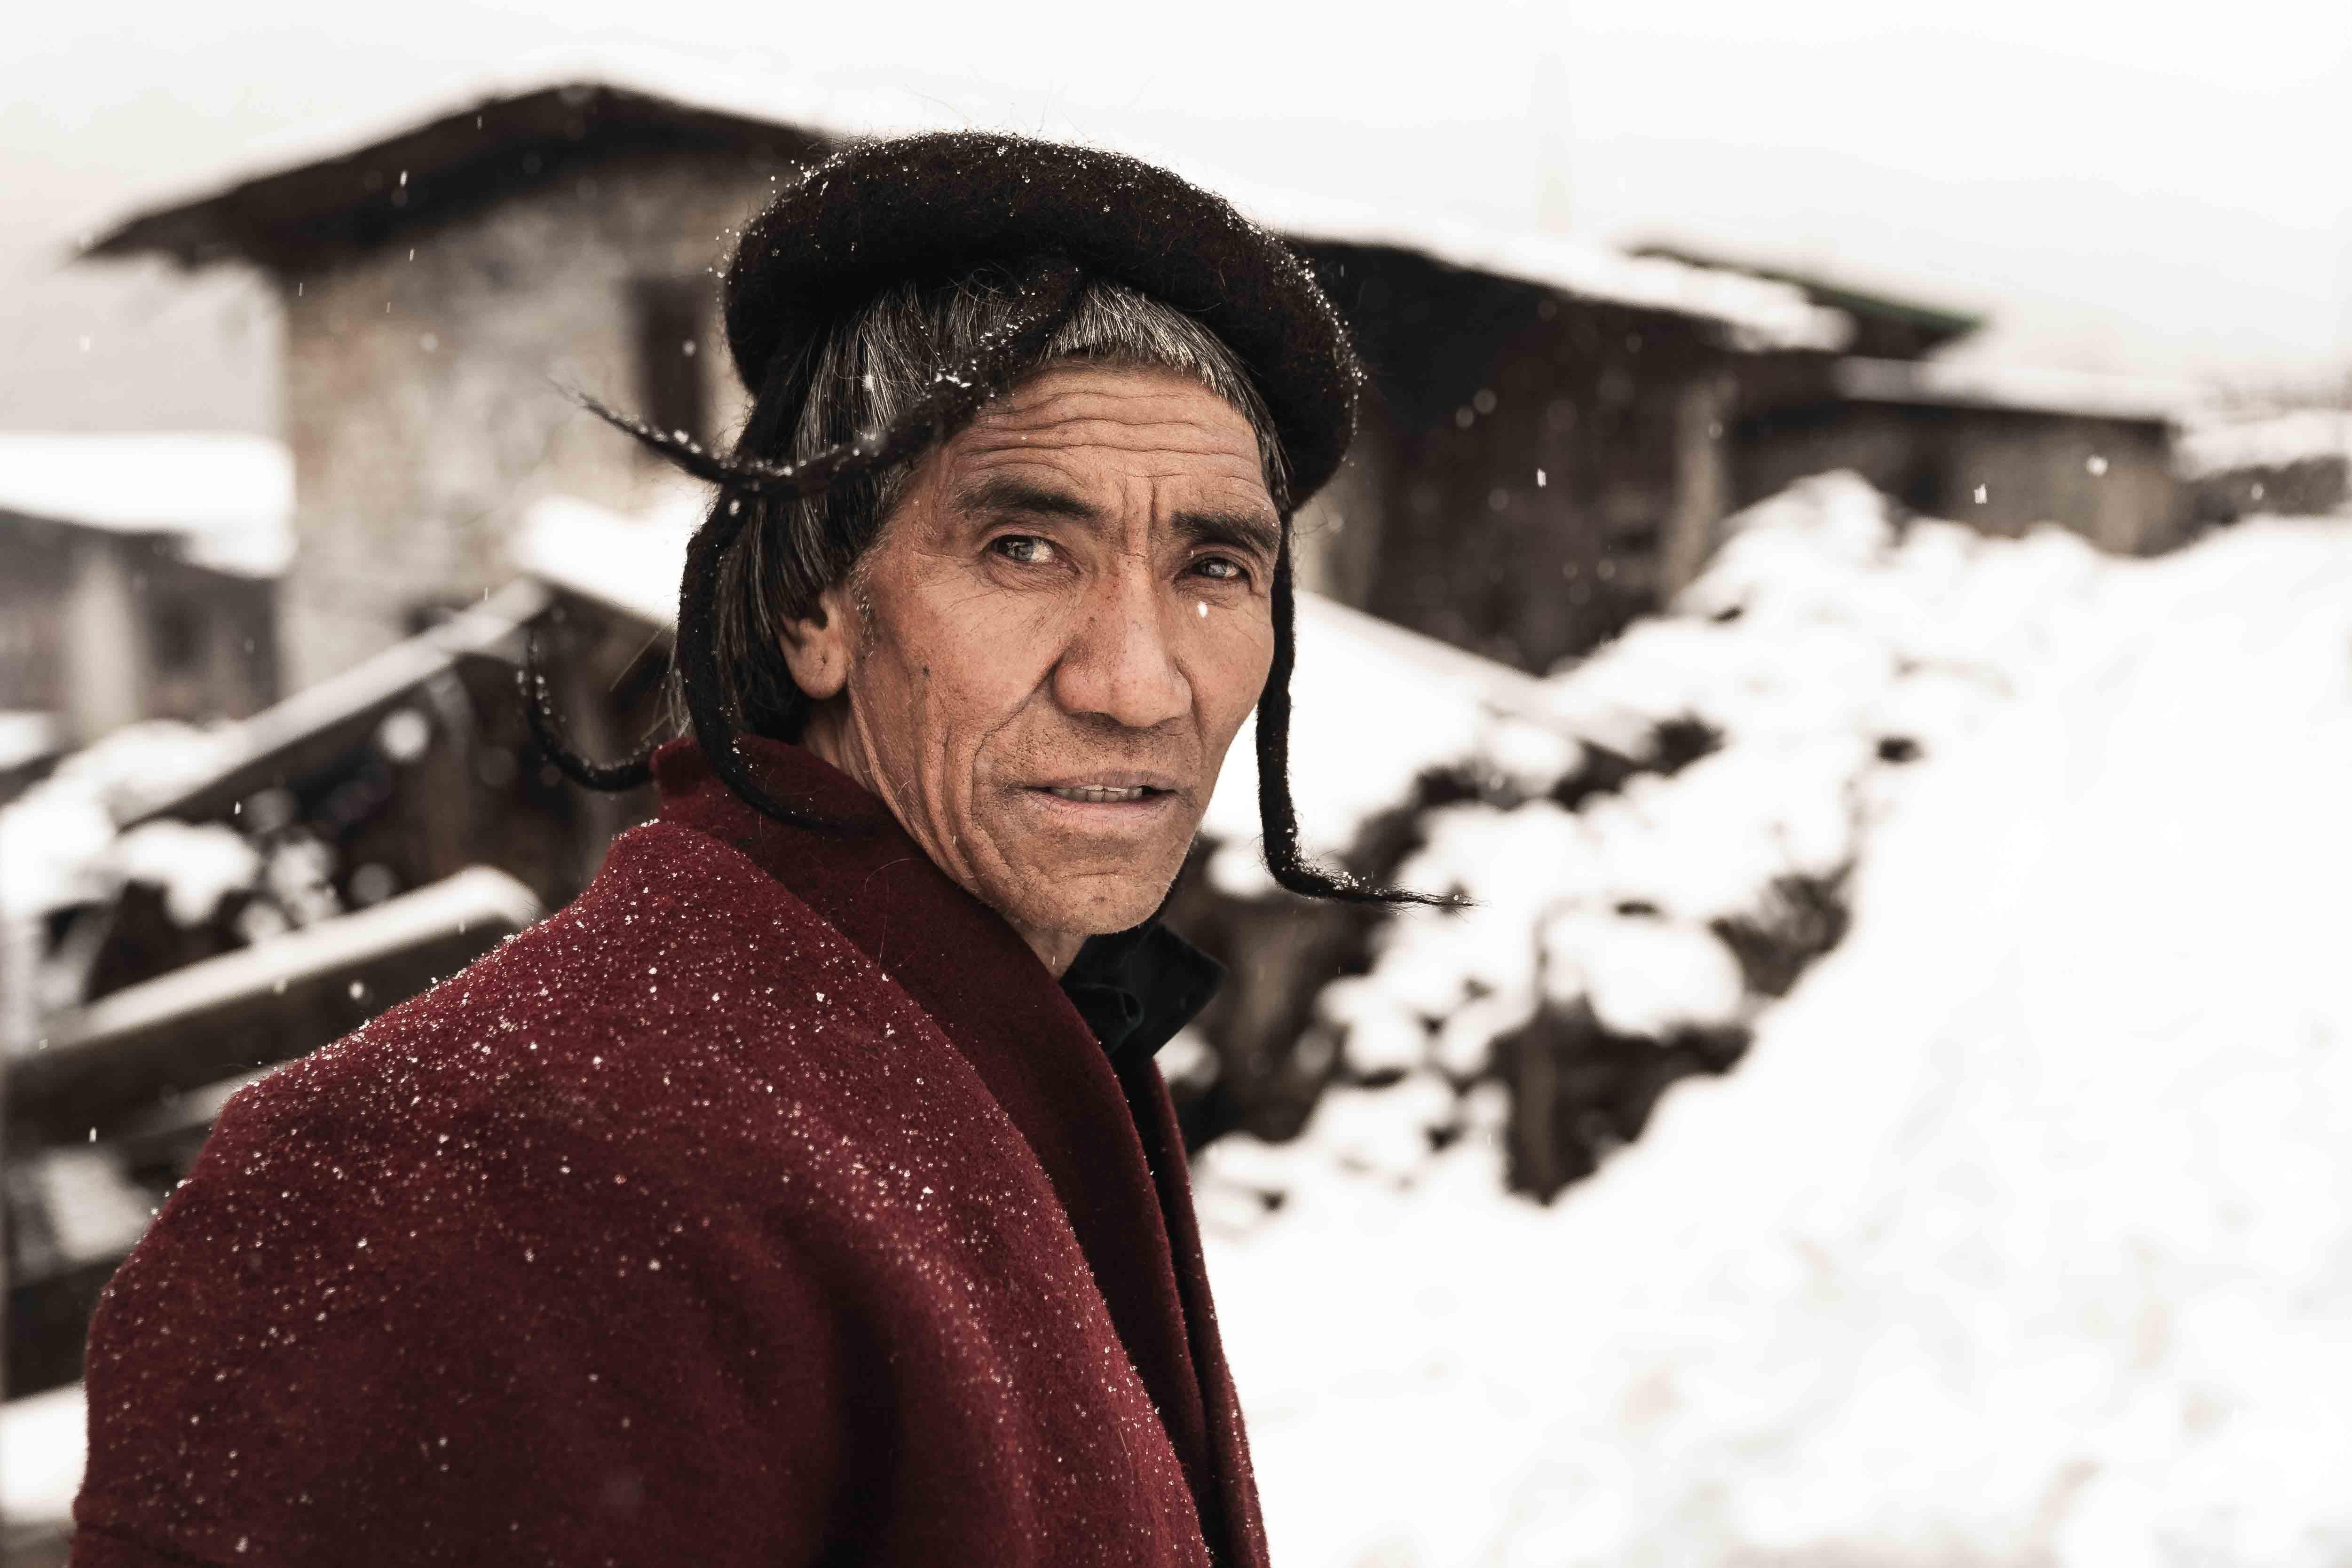 Bhutan portrait photography of the Brokpa Tribe in Merak during winter